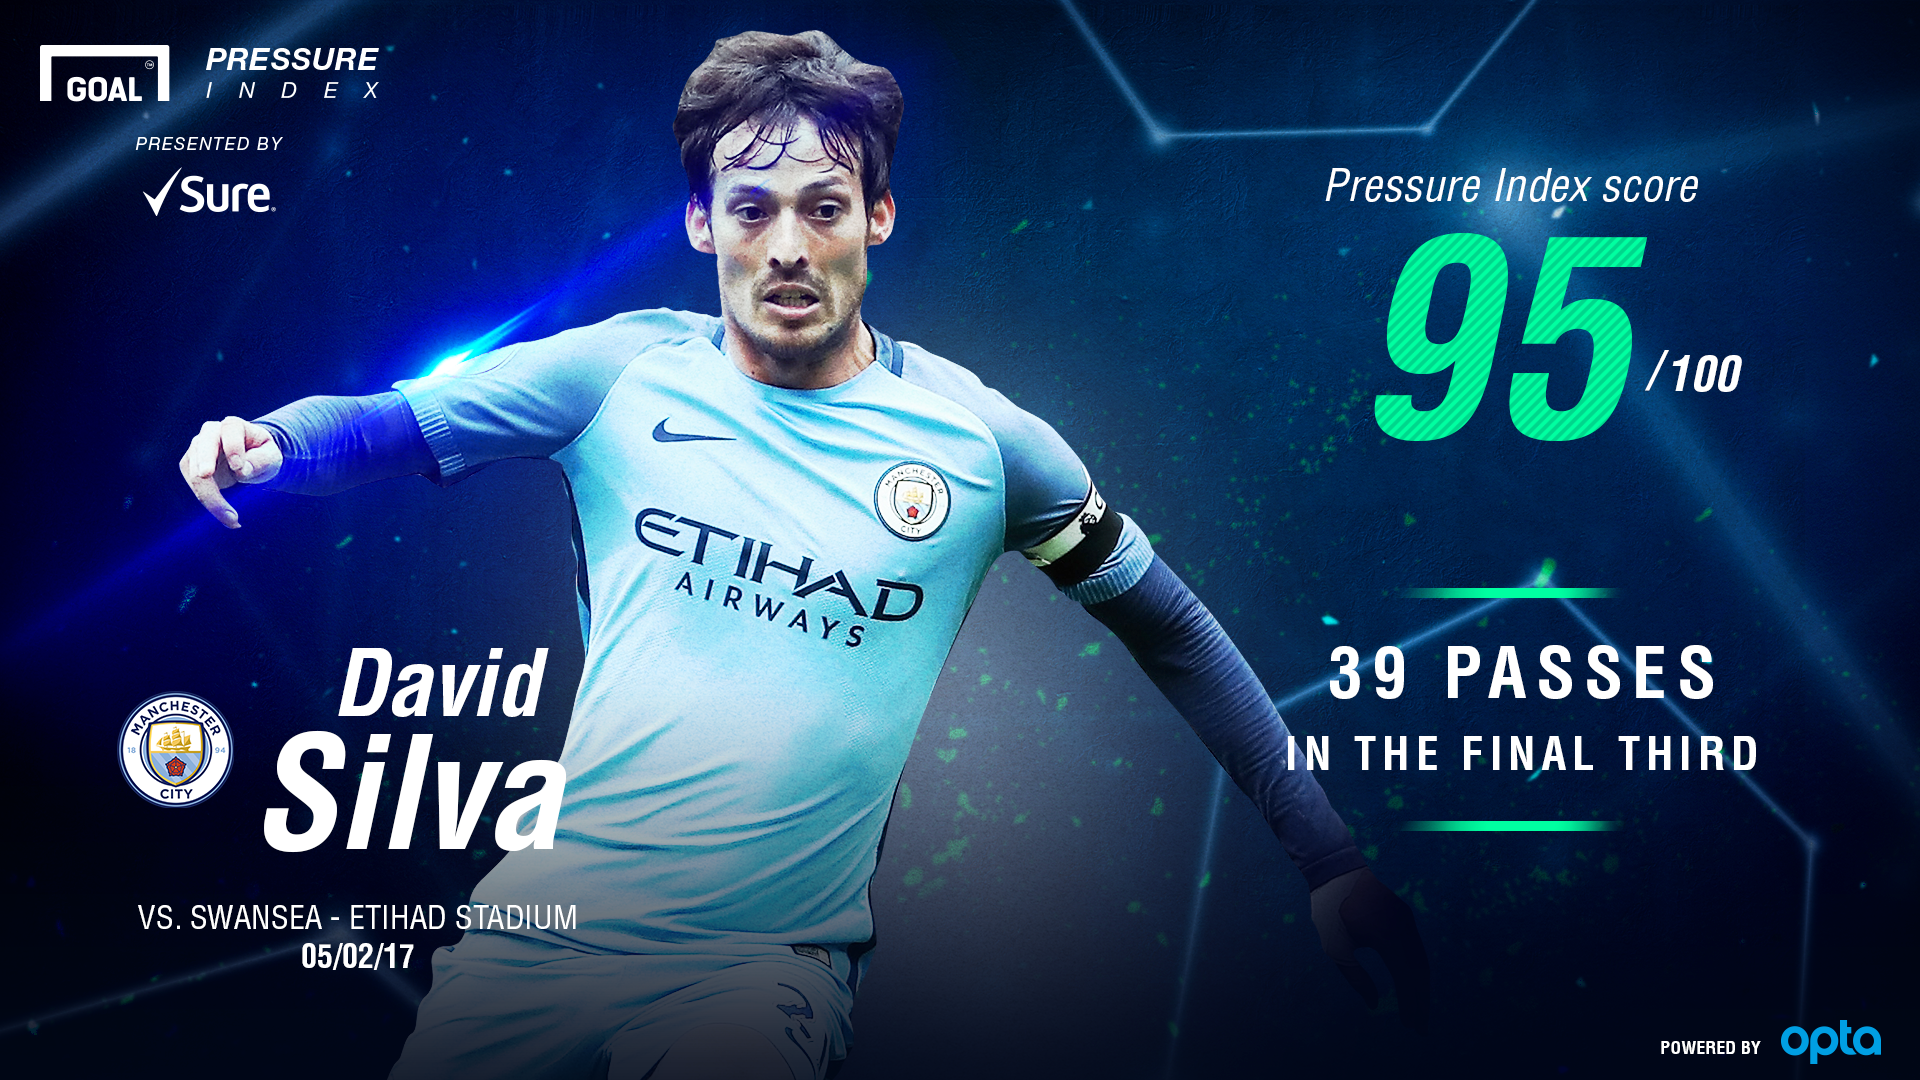 David Silva Pressure Index